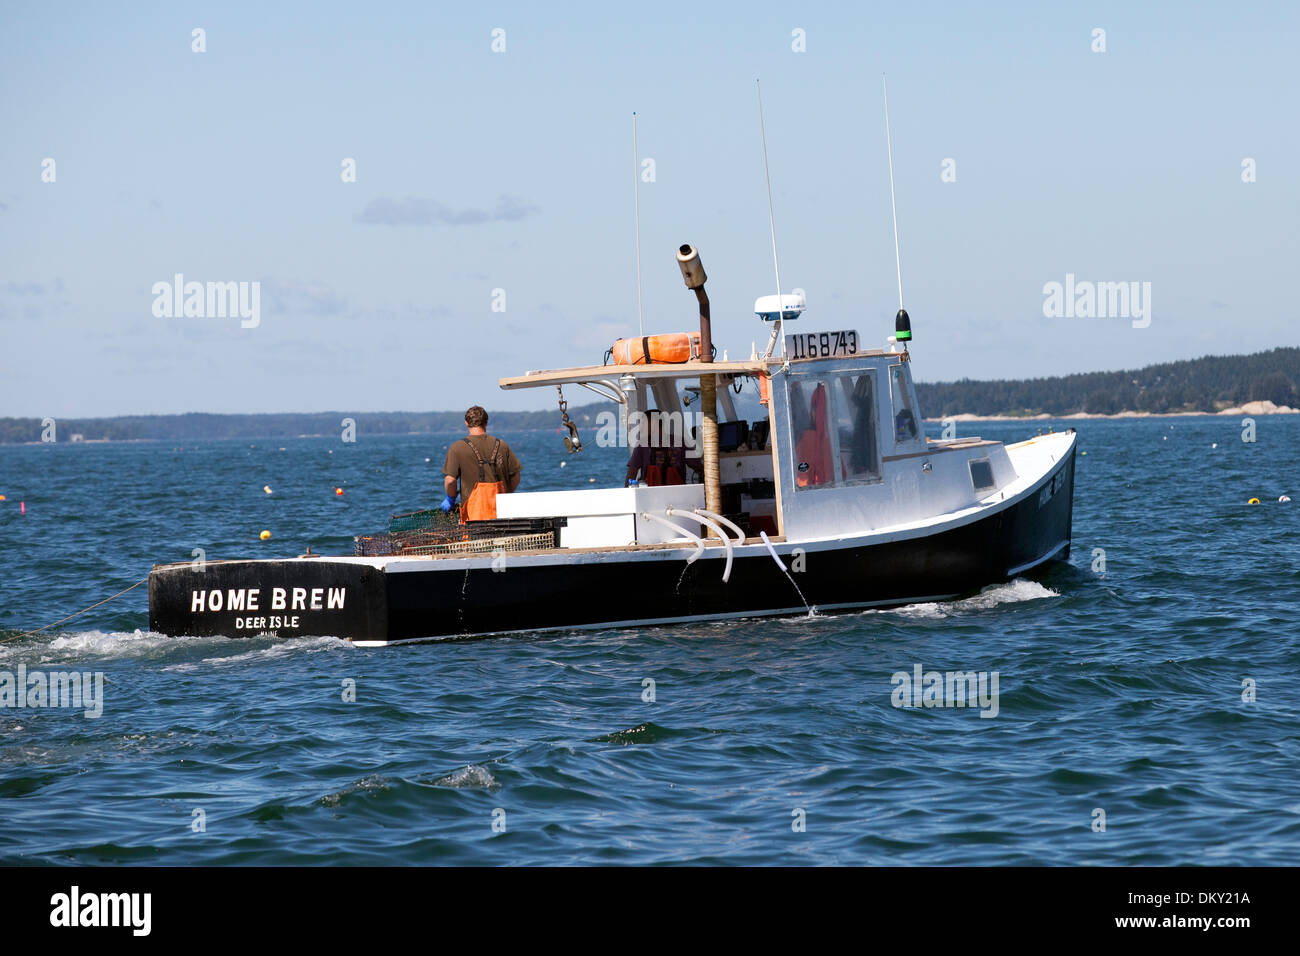 Boats yachts maine boats lobster boats picnic boats sailing - Working Lobster Boat Maine Stock Image